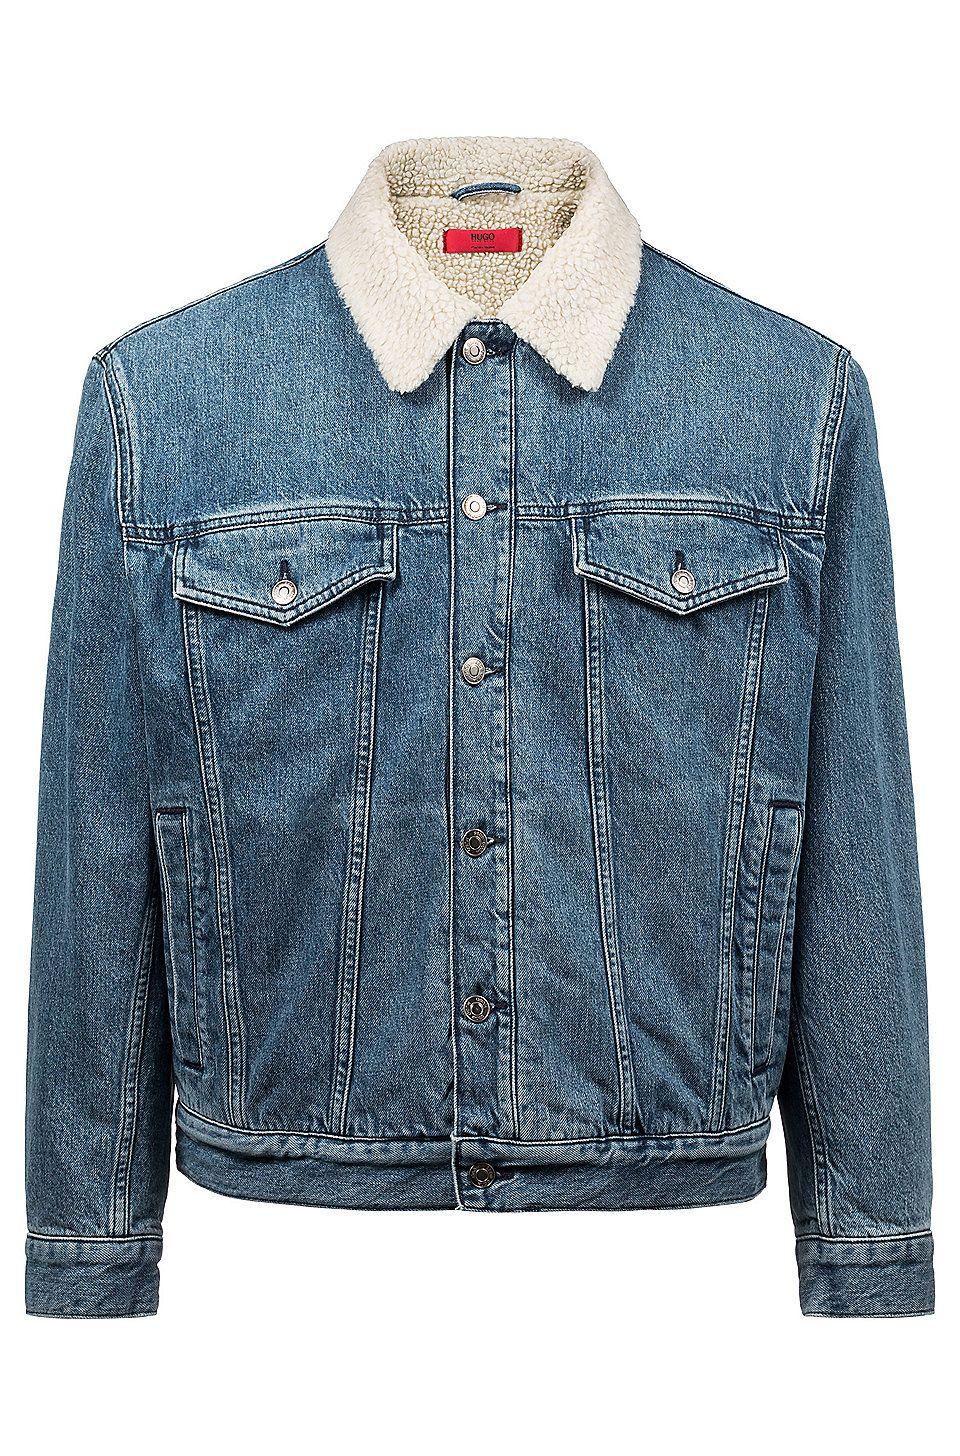 Unisex Denim collared jacket